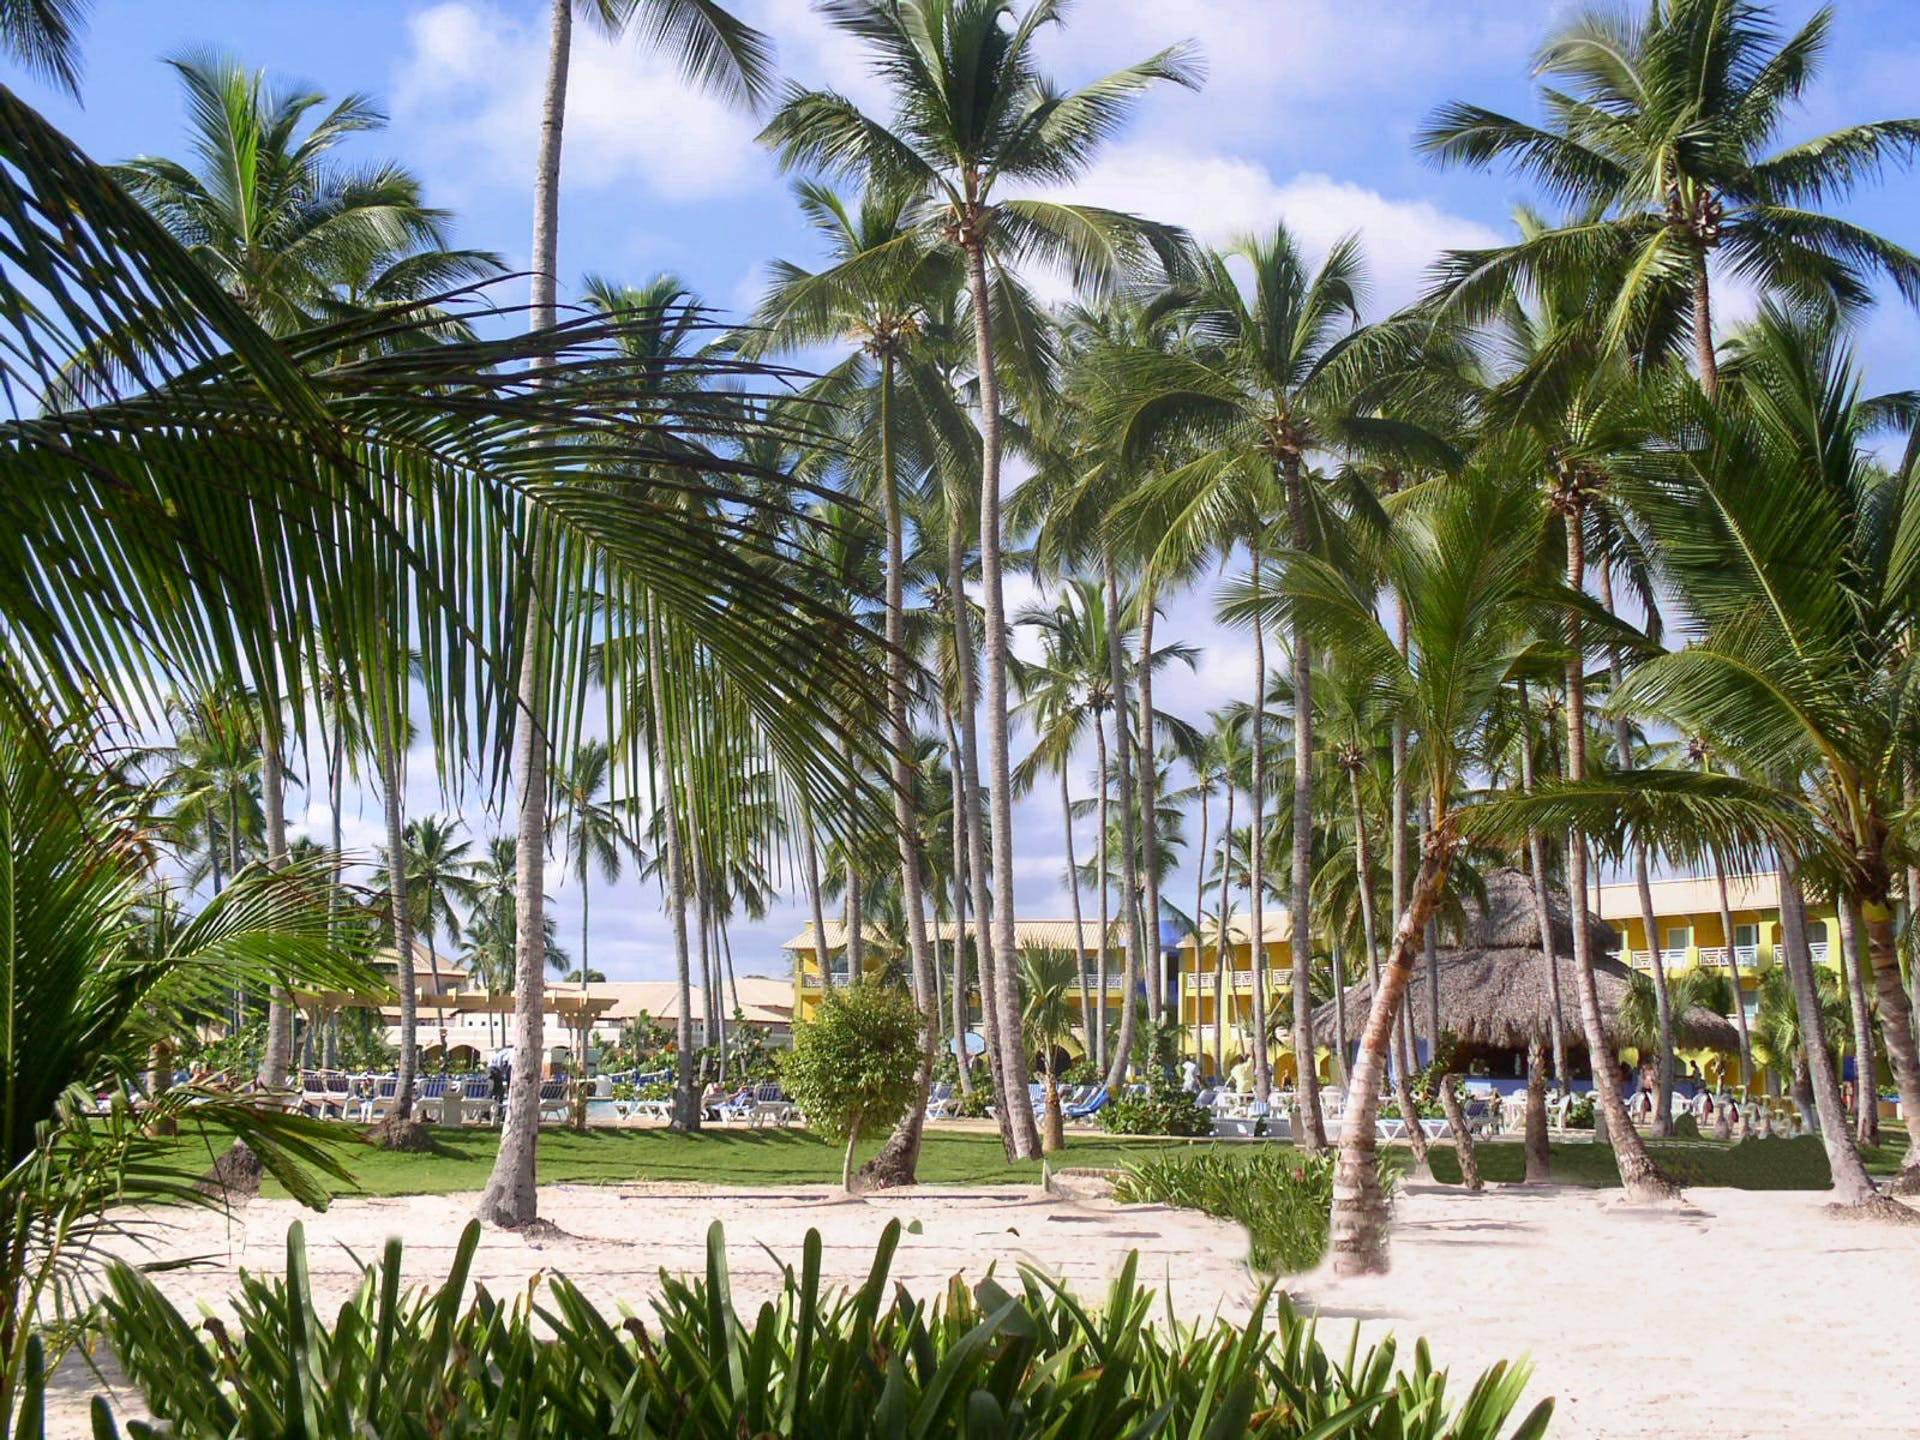 Free stock photo of holiday, warm, caribbean, palm trees